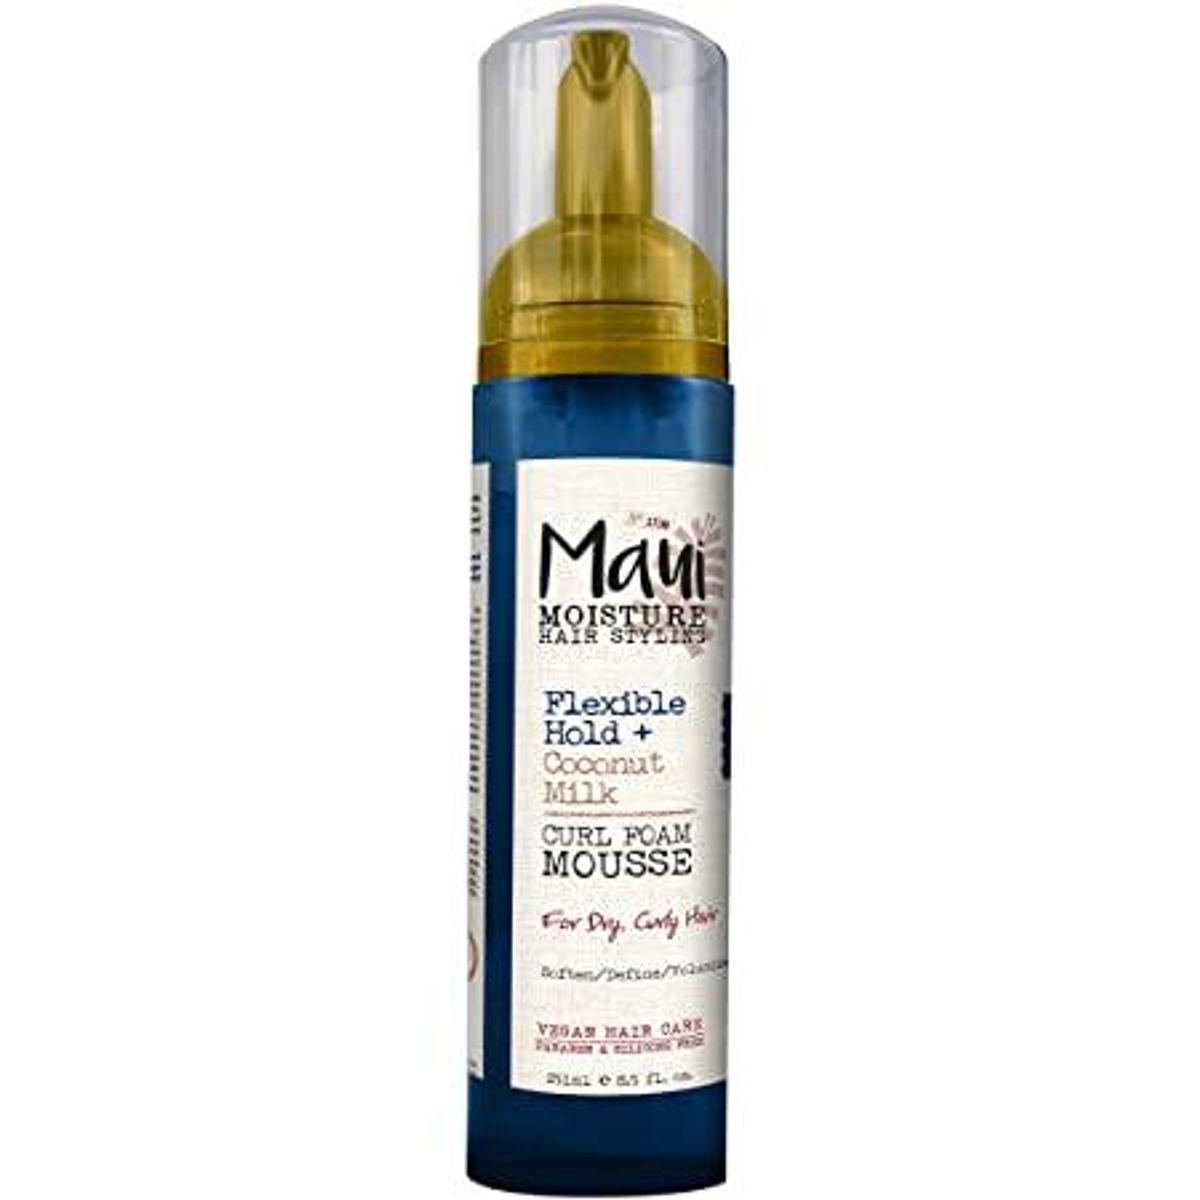 maui moisture flexible hold and coconut milk curl foam mousse